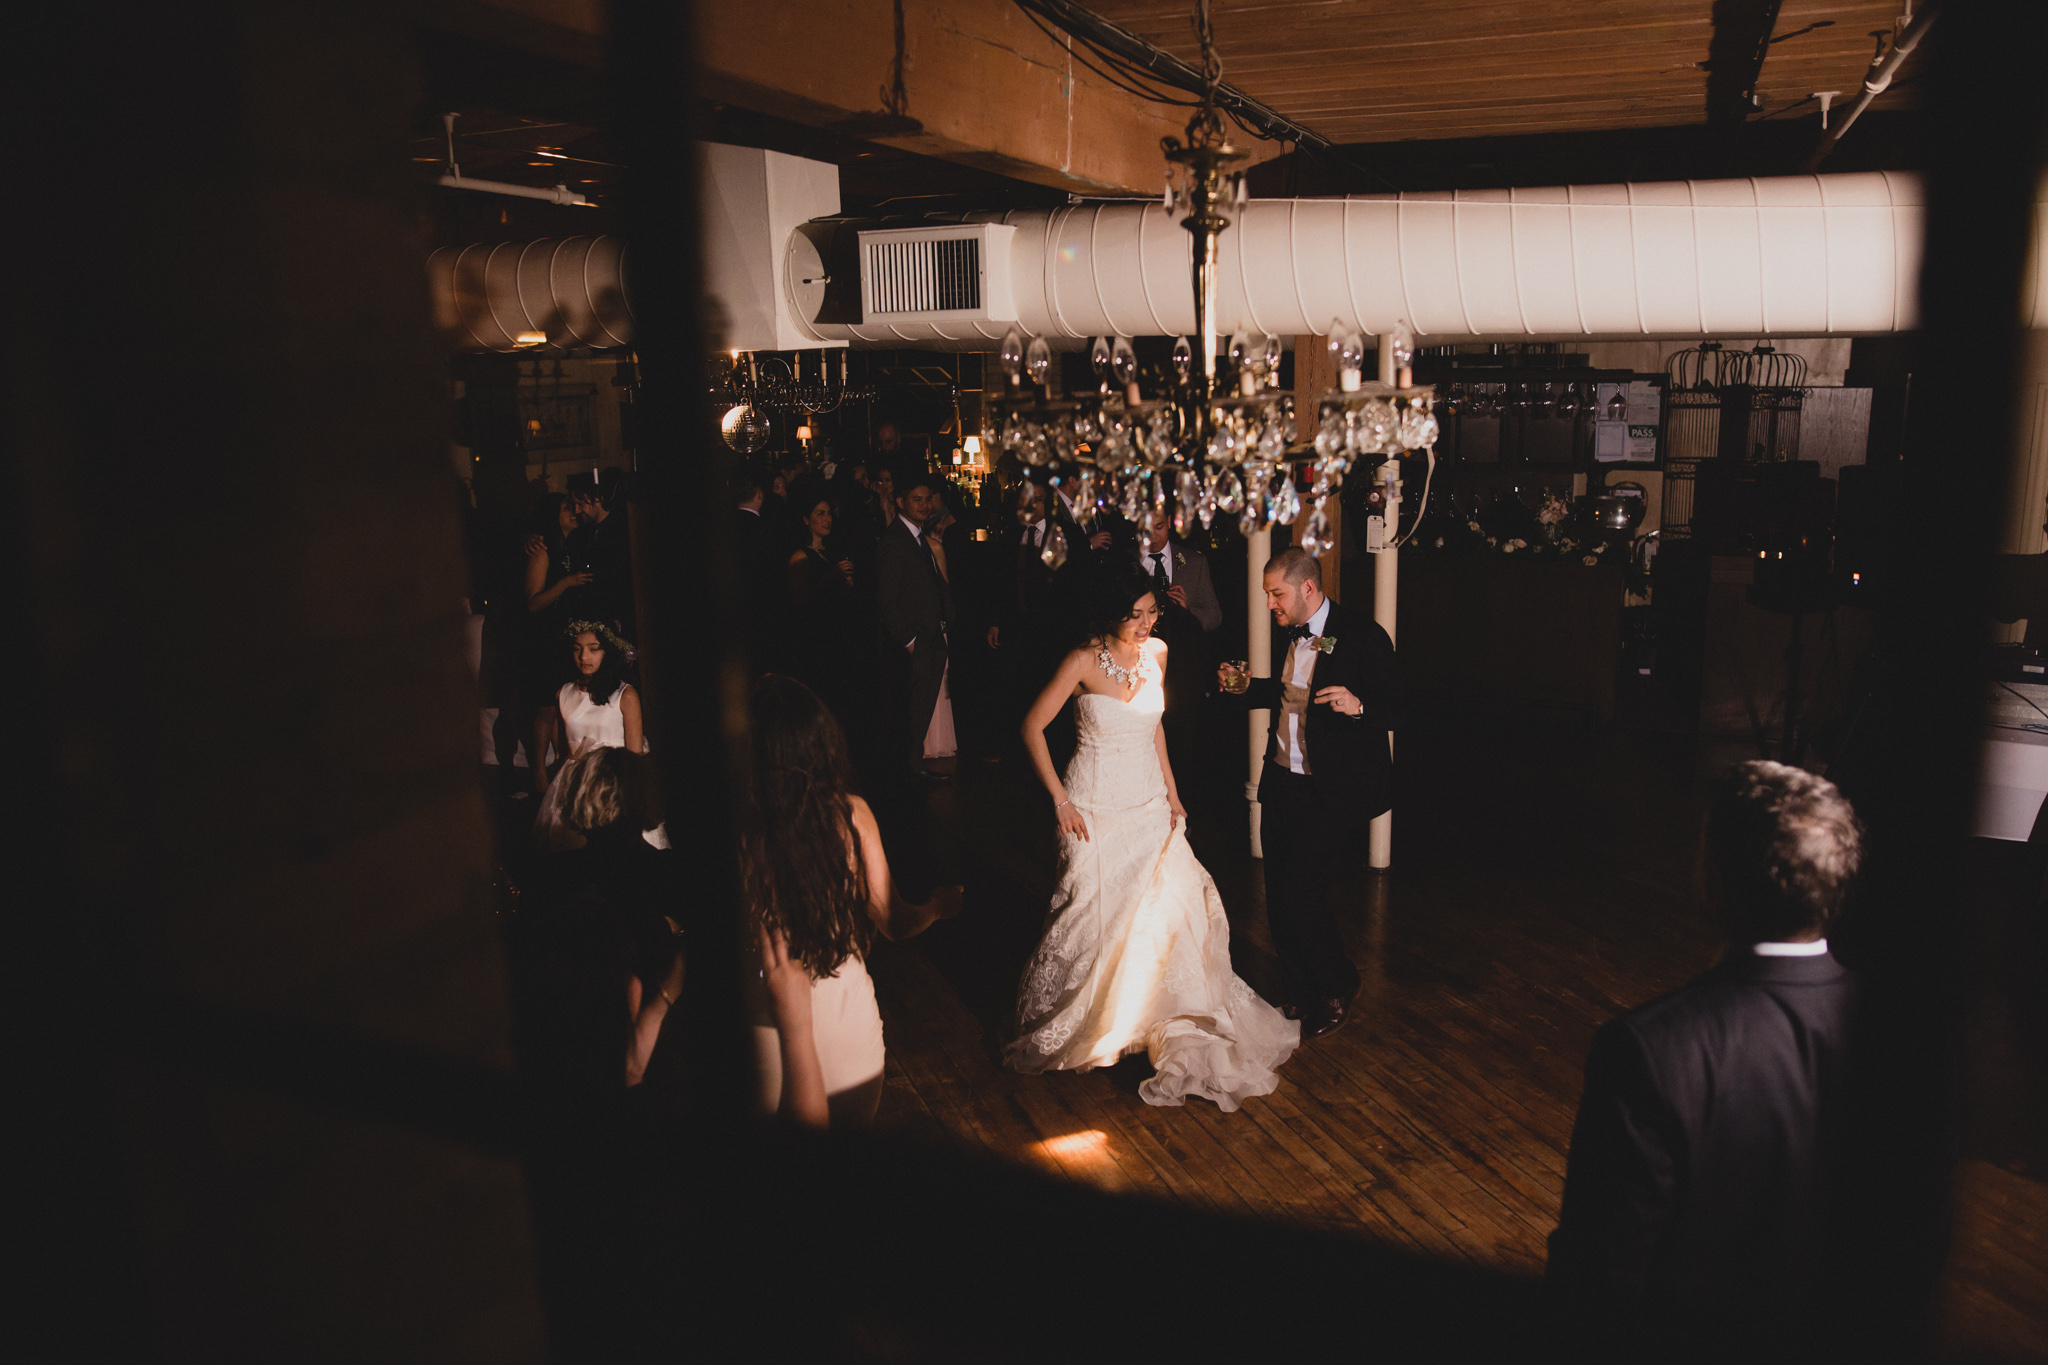 The Fifth Wedding Venue Dance